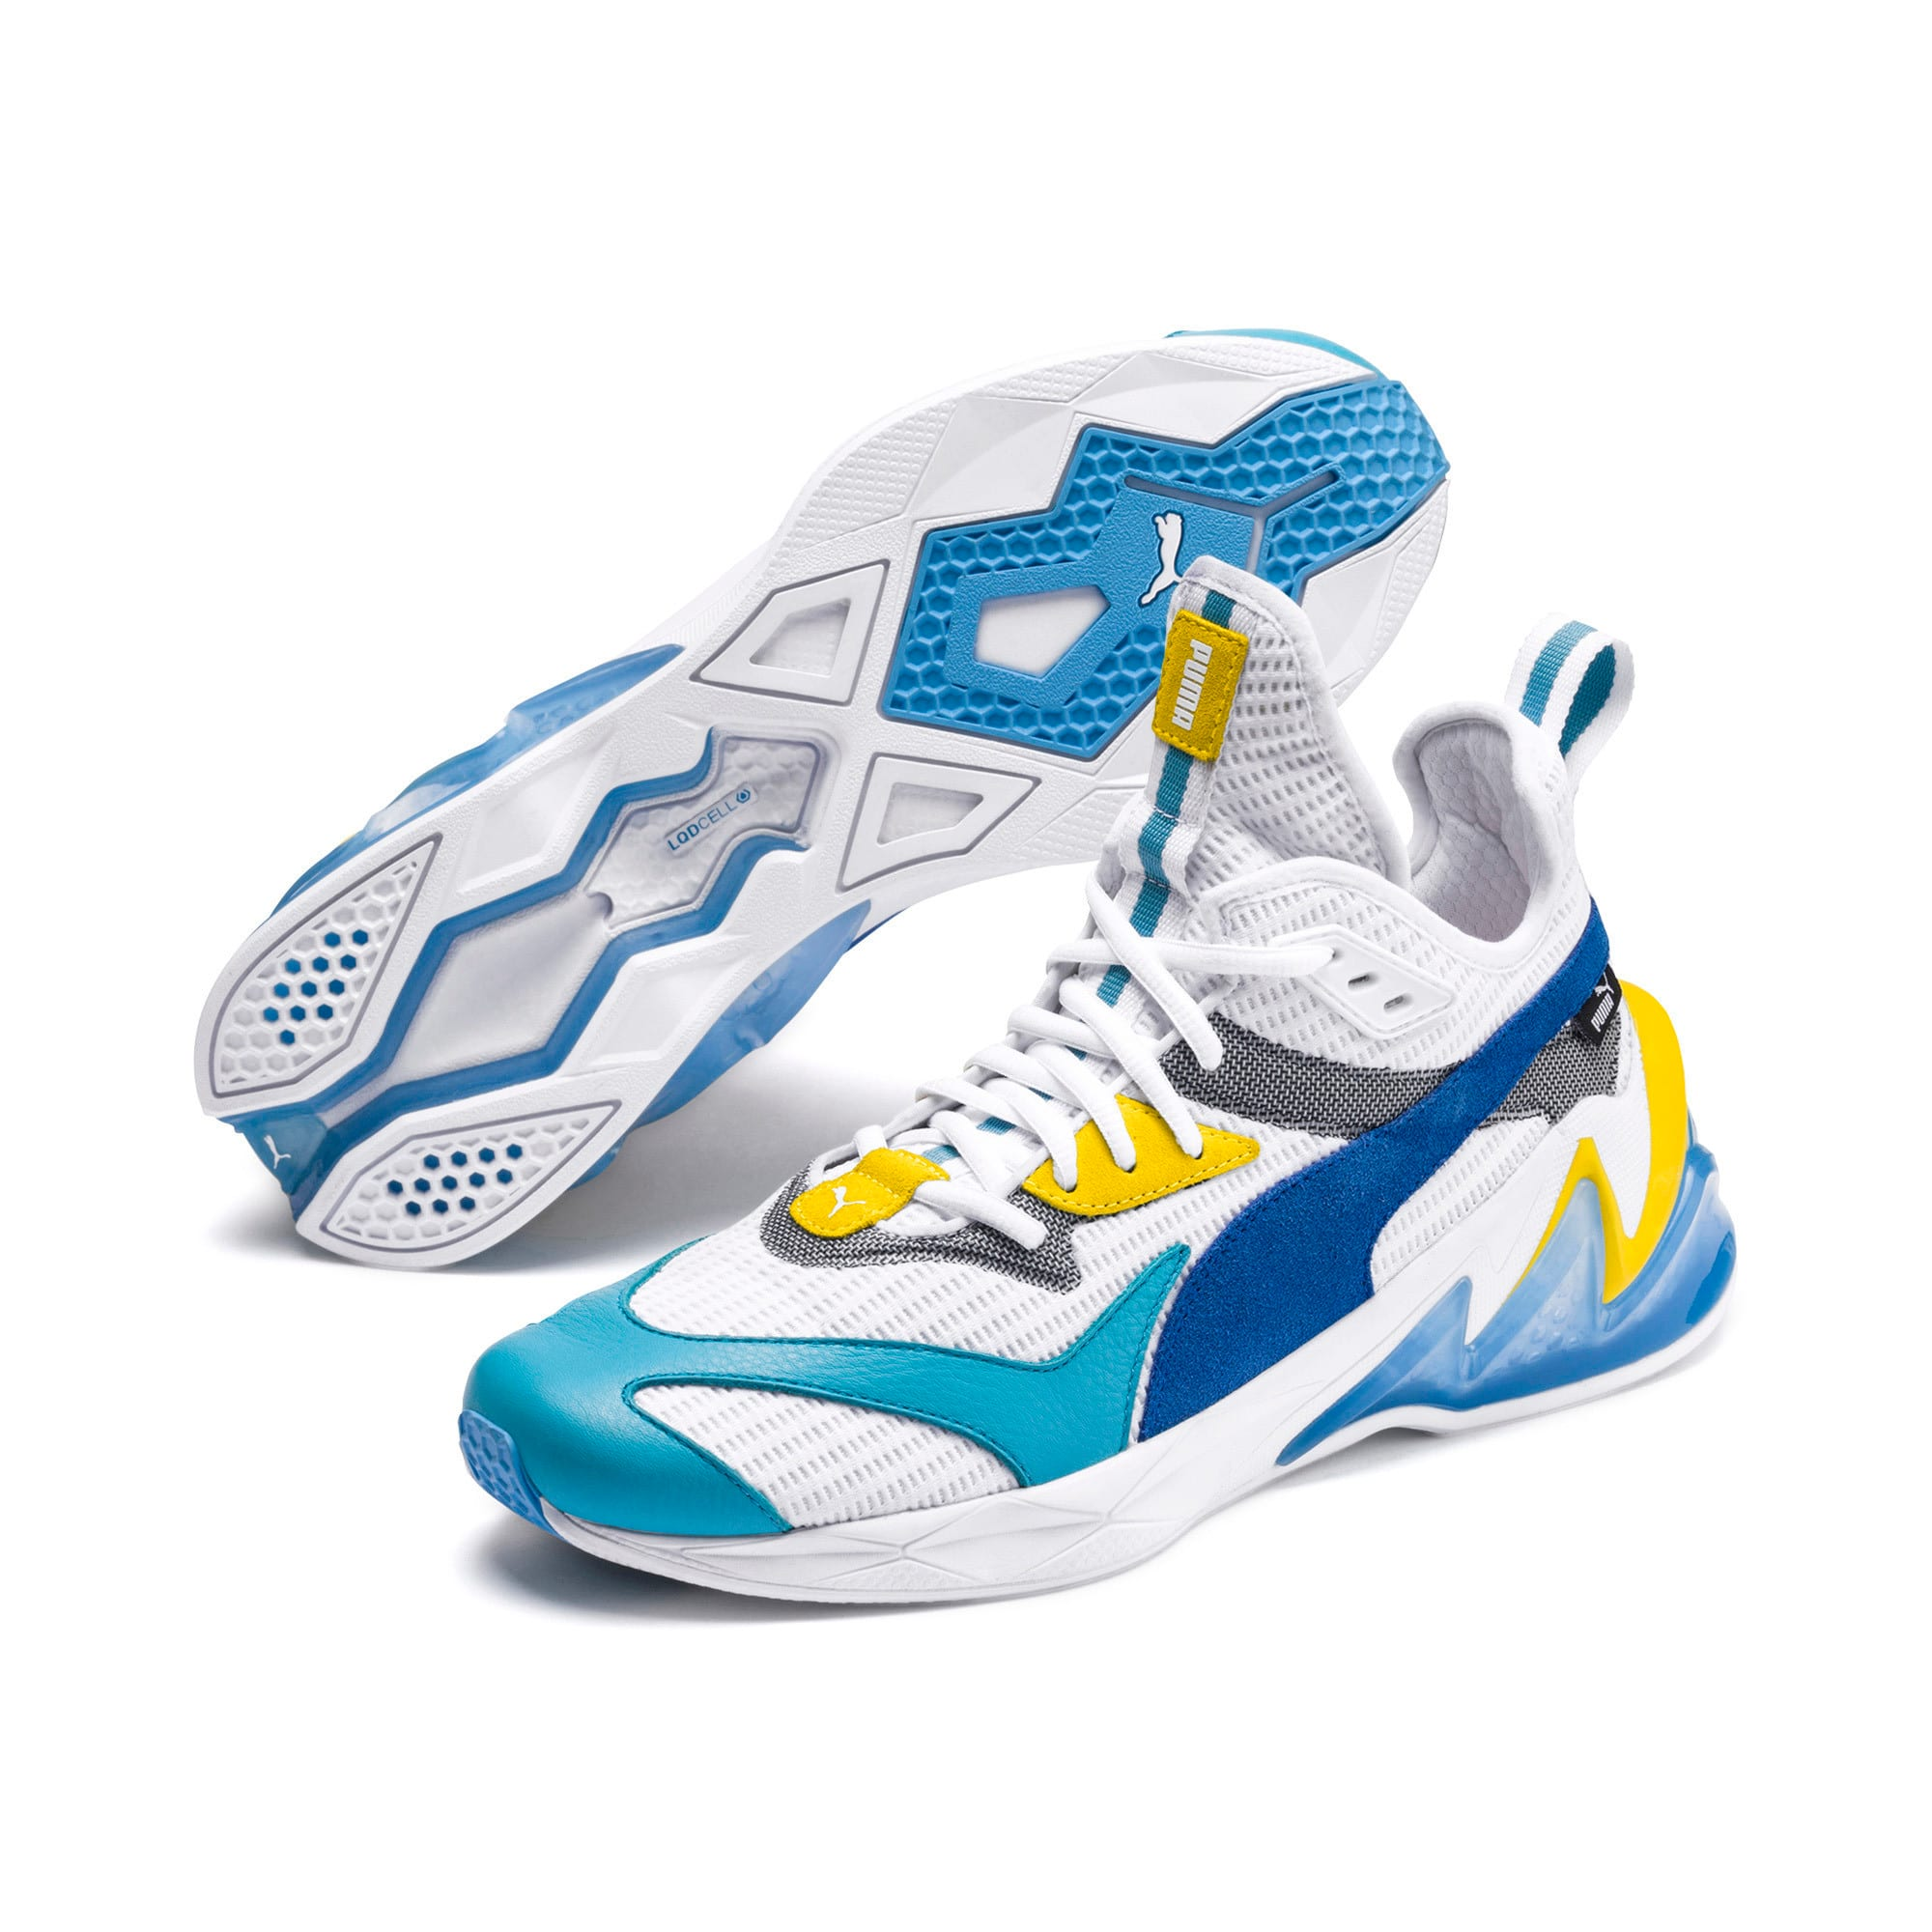 Thumbnail 2 of LQDCELL Origin Men's Training Shoes, Puma White-B Blue-Blz Yellow, medium